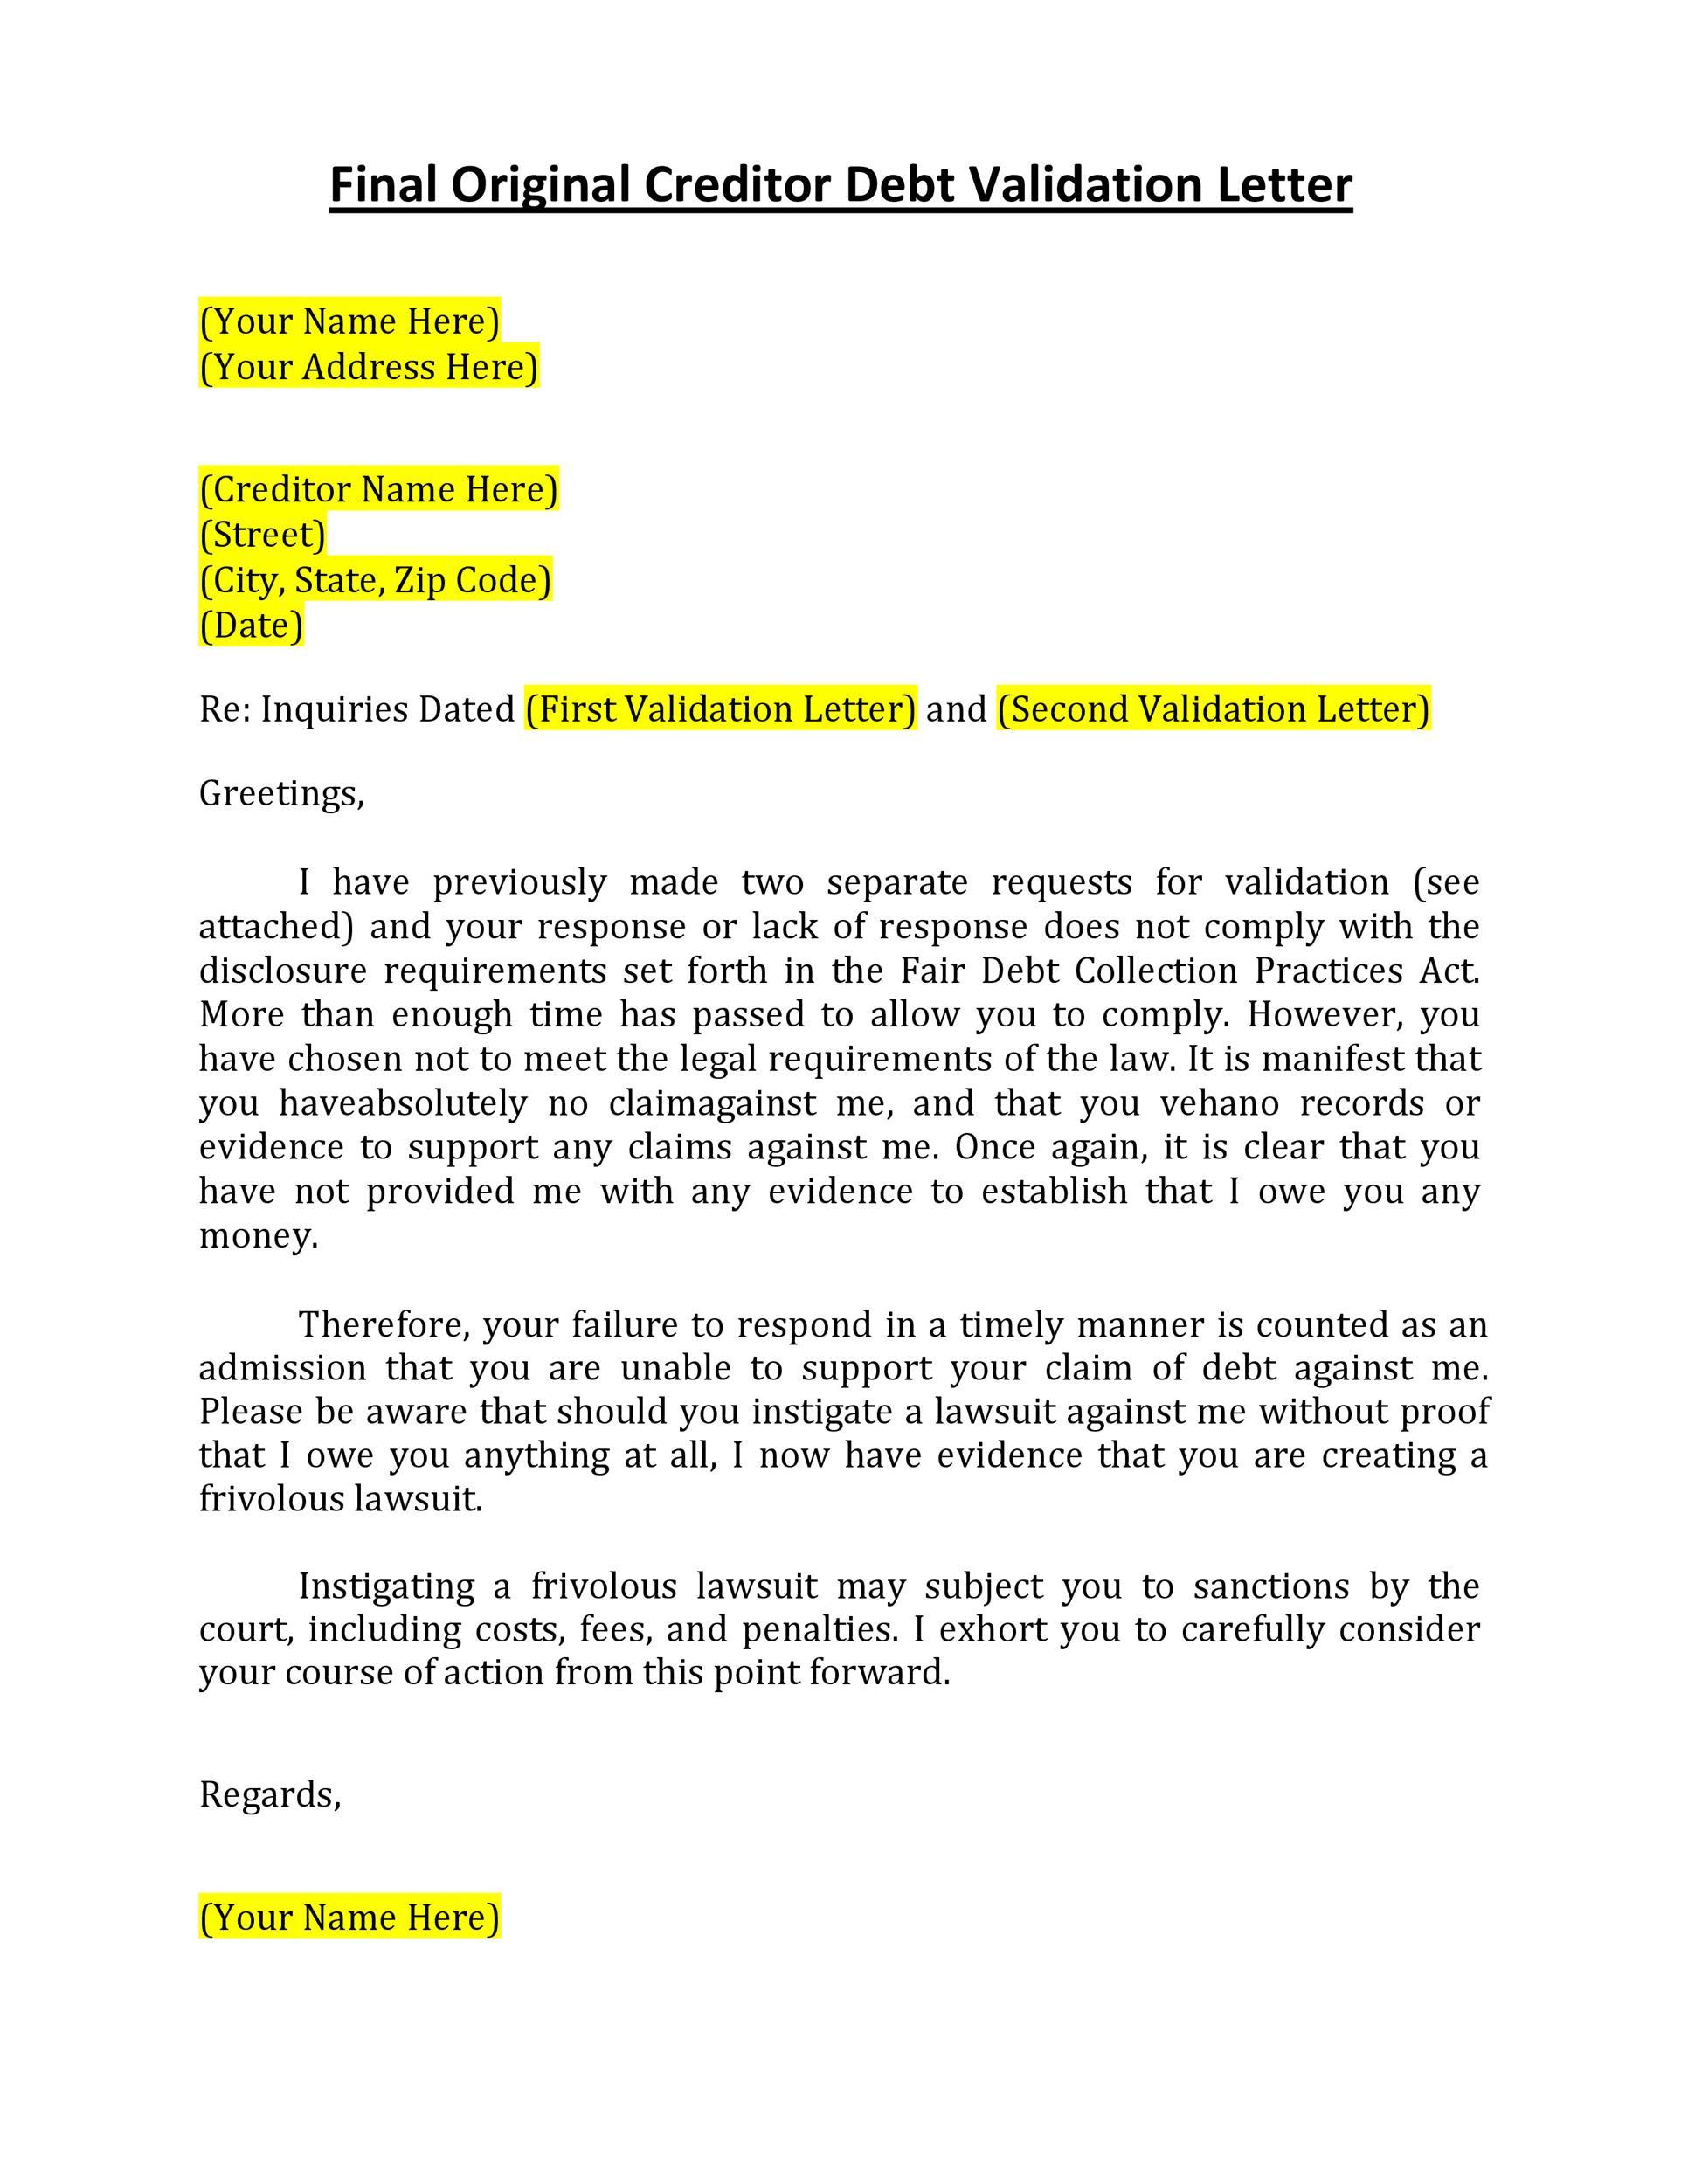 Free debt validation letter 11